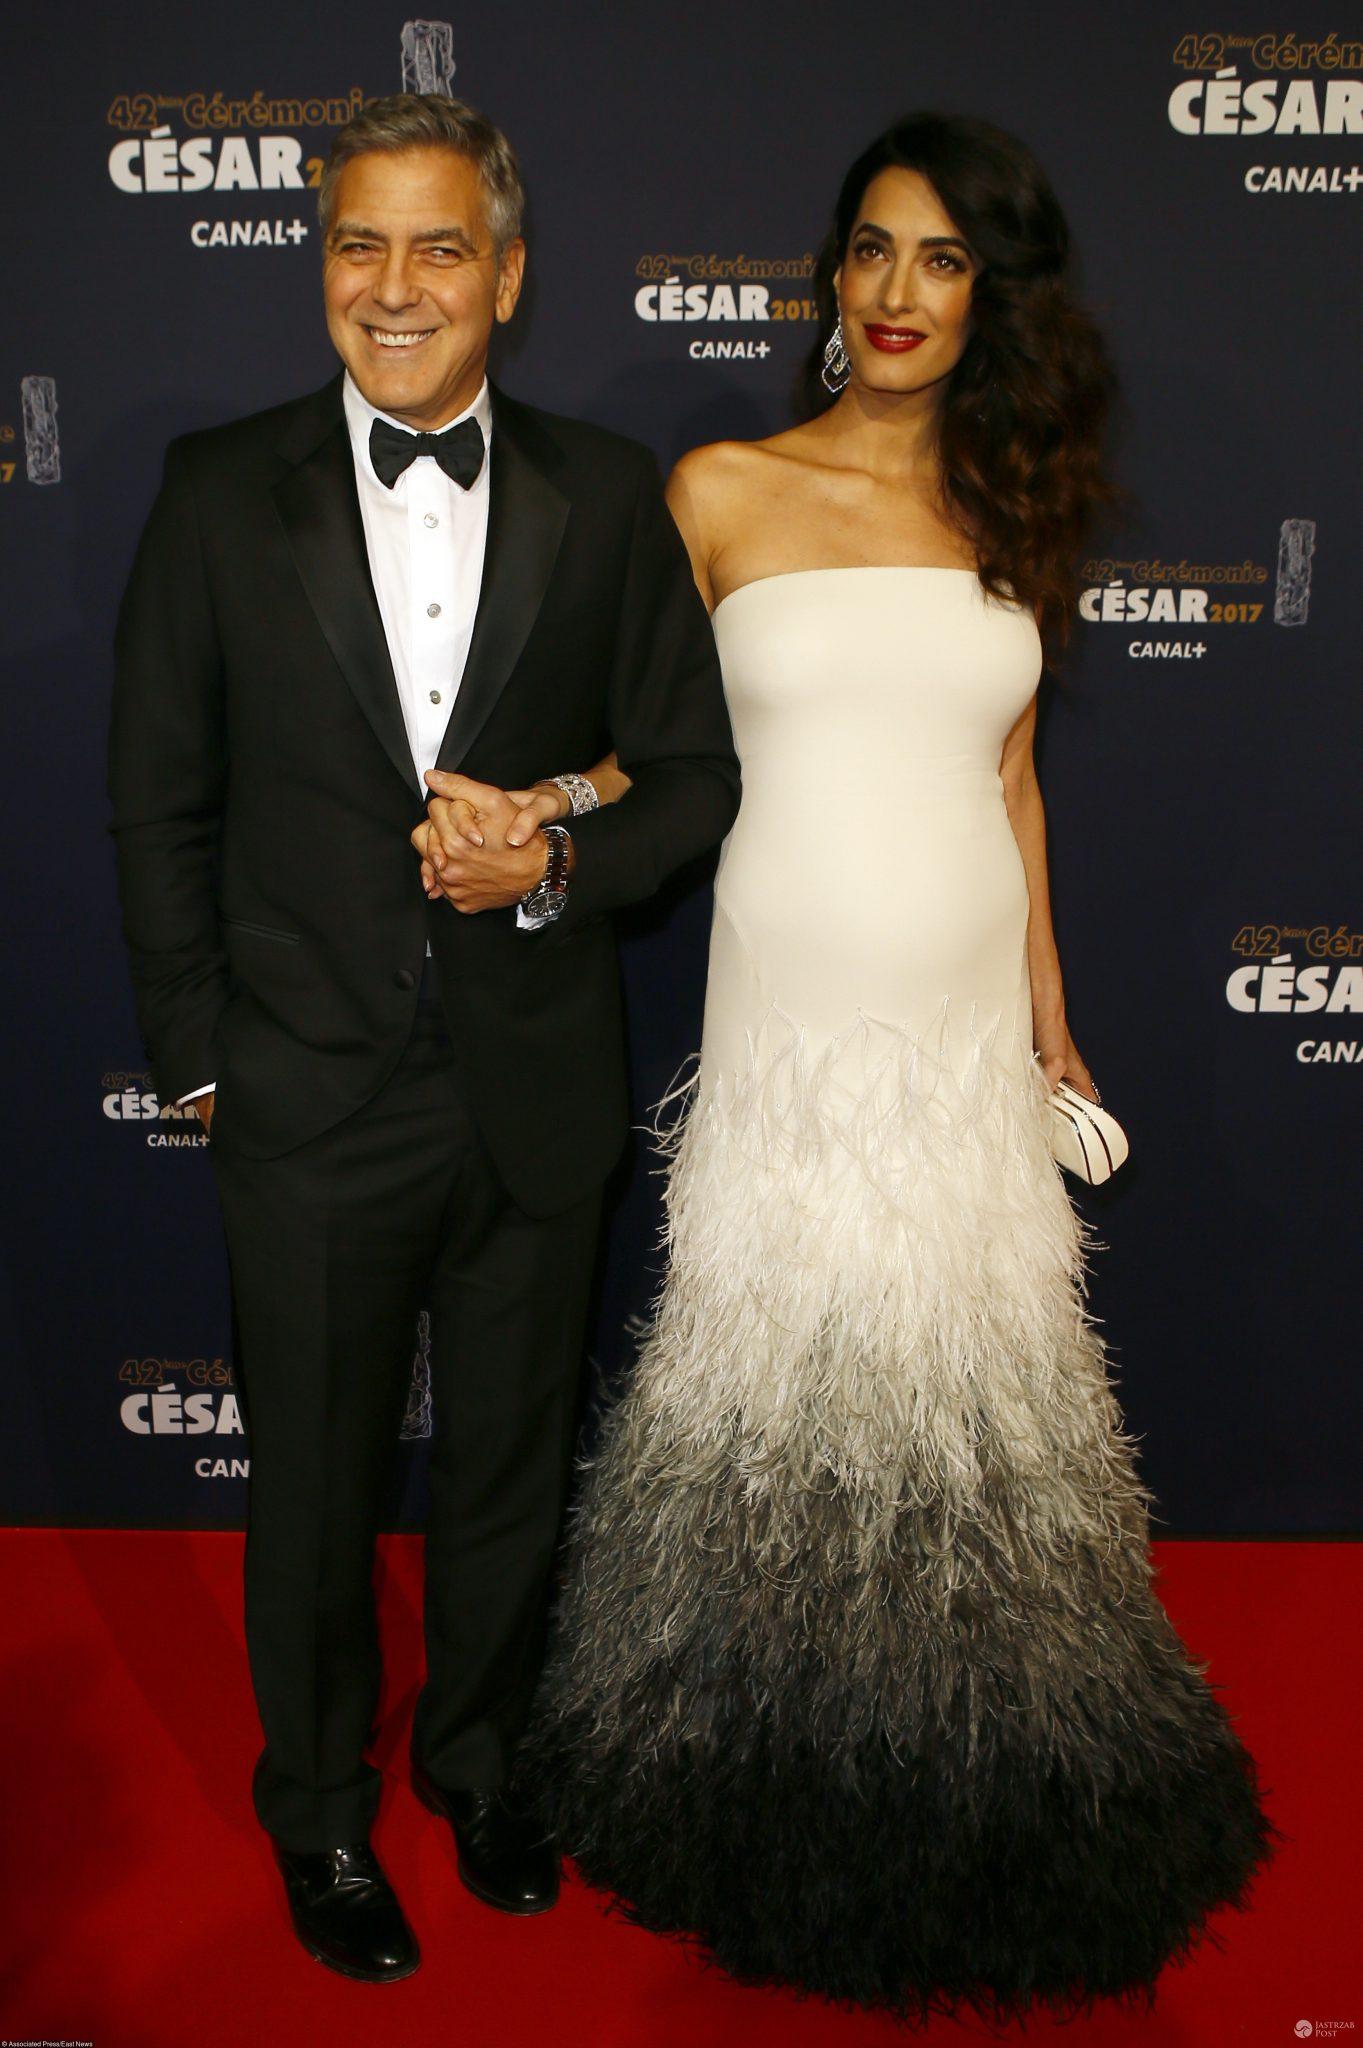 George Clooney i Amal Clooney na gali Cesar FIlm Awards 2017